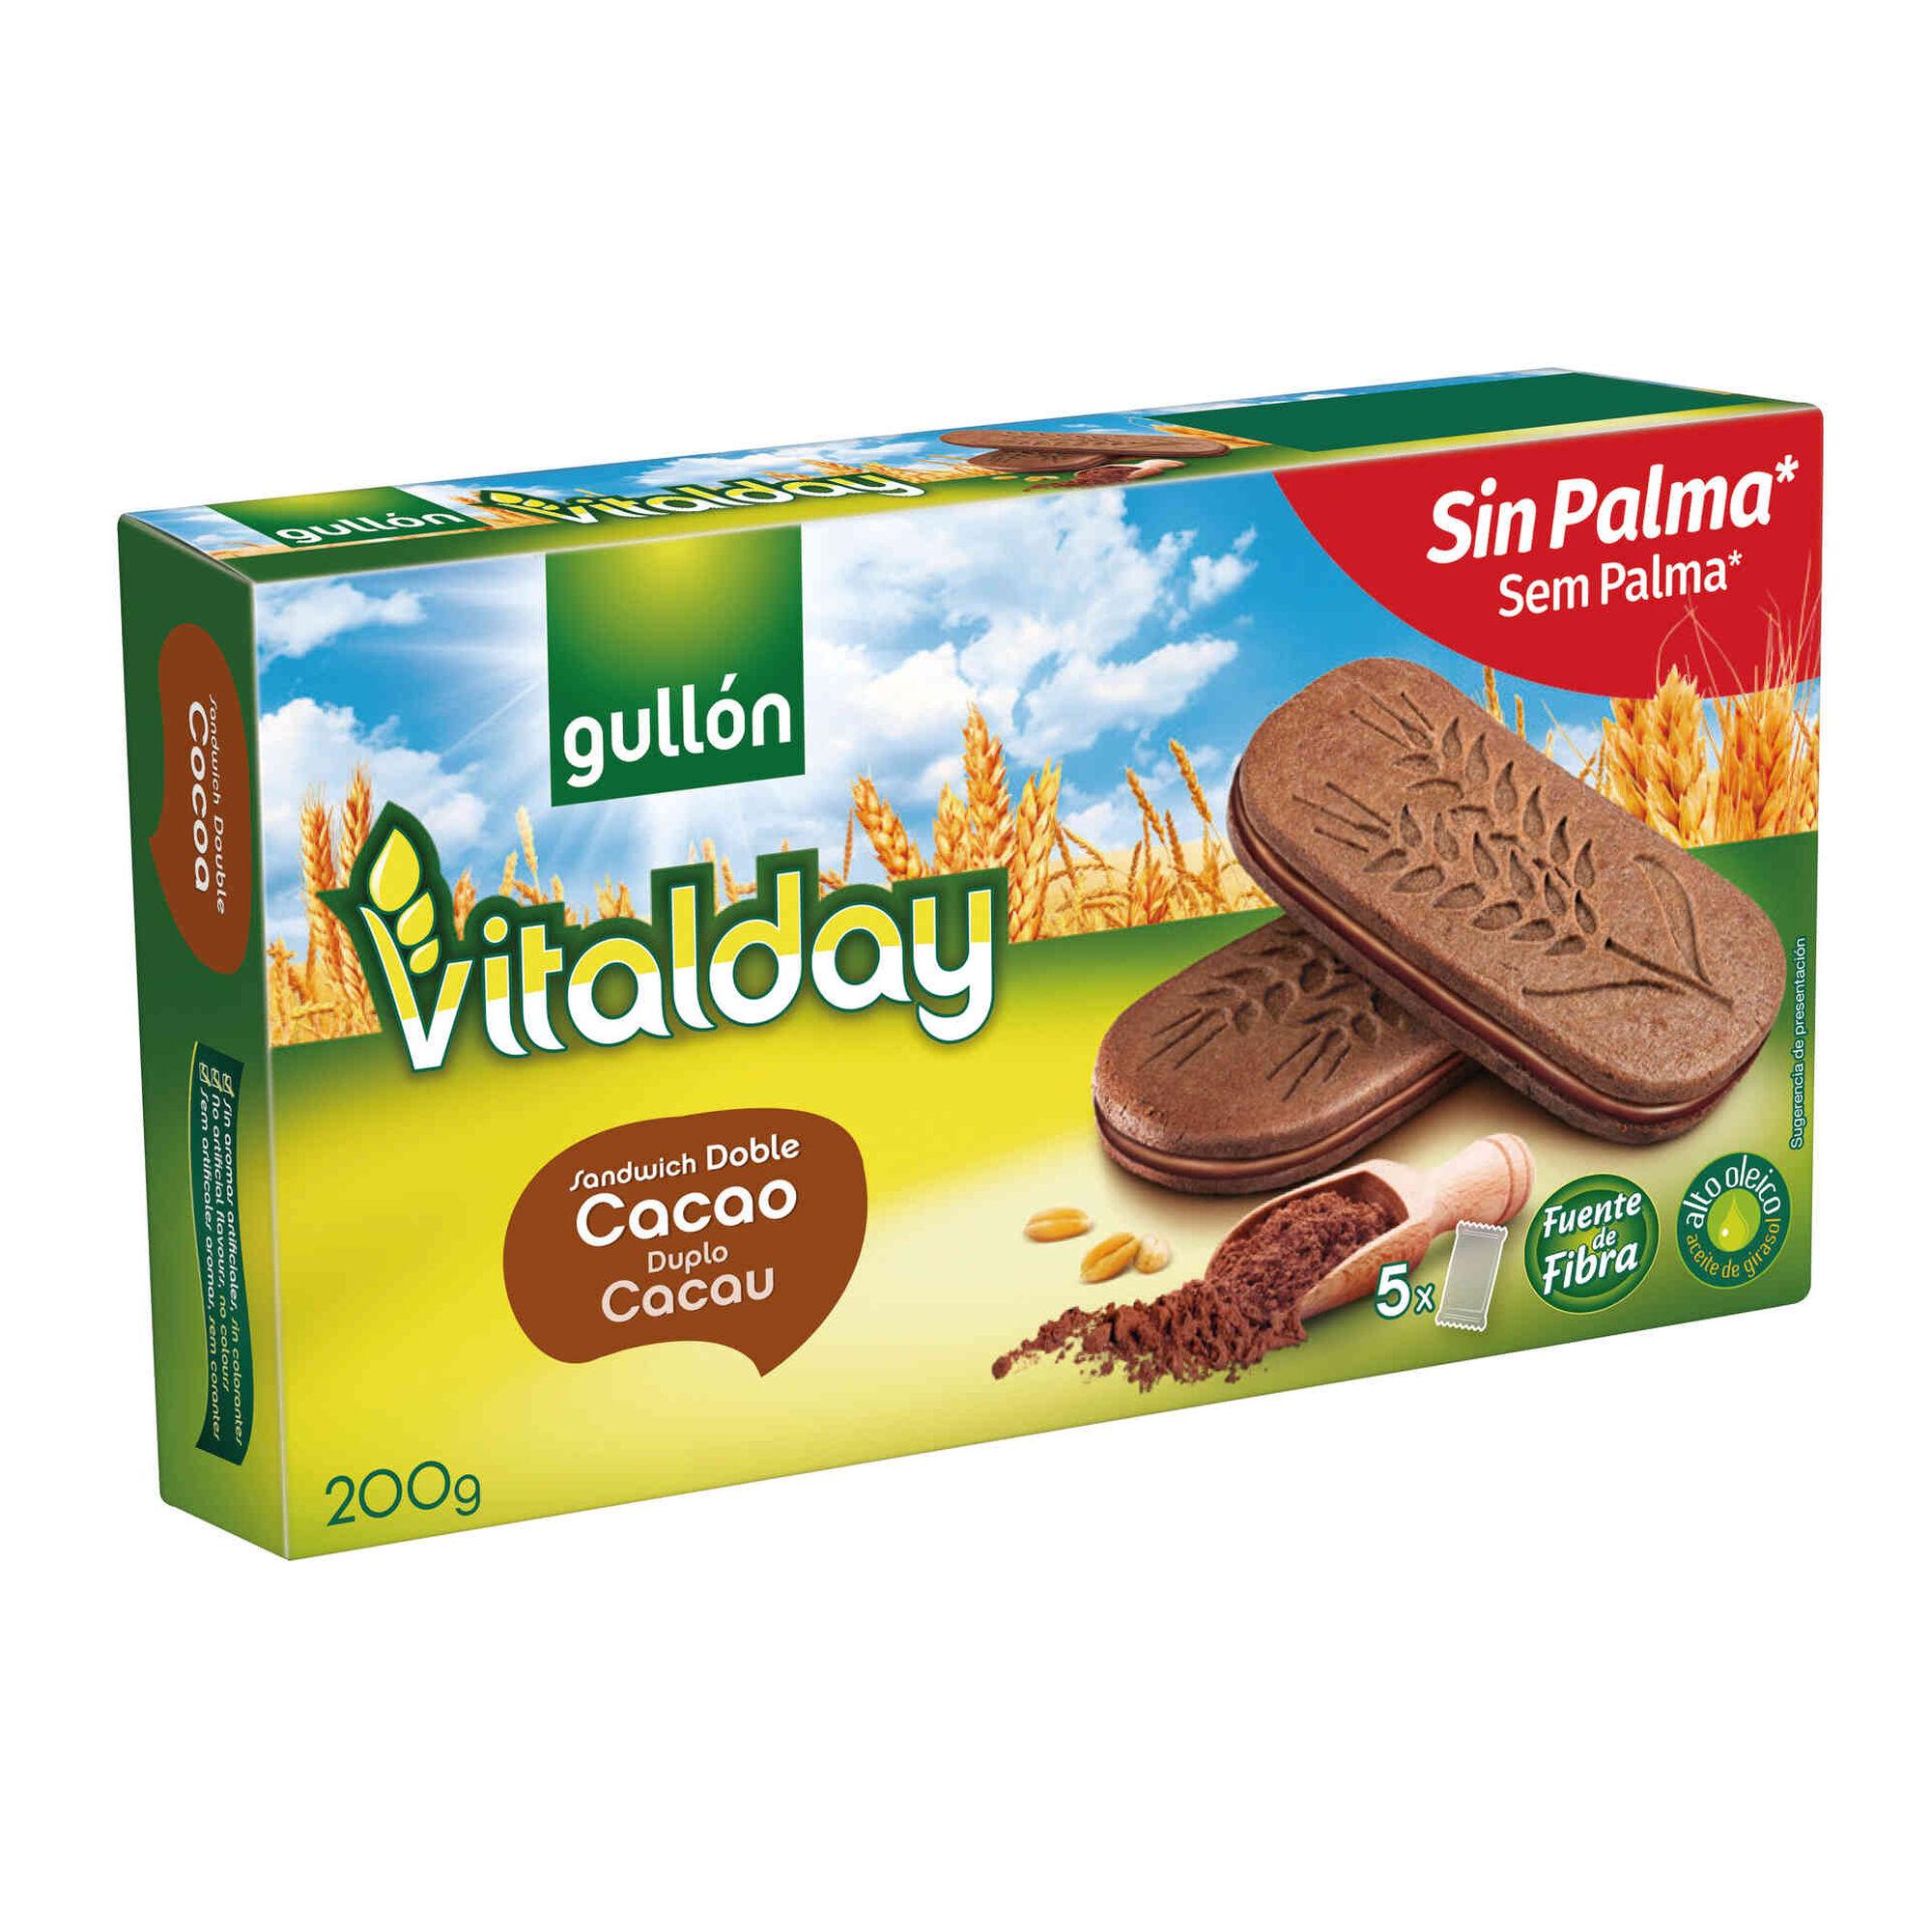 Bolachas Vitalday Recheadas Duplo Cacau